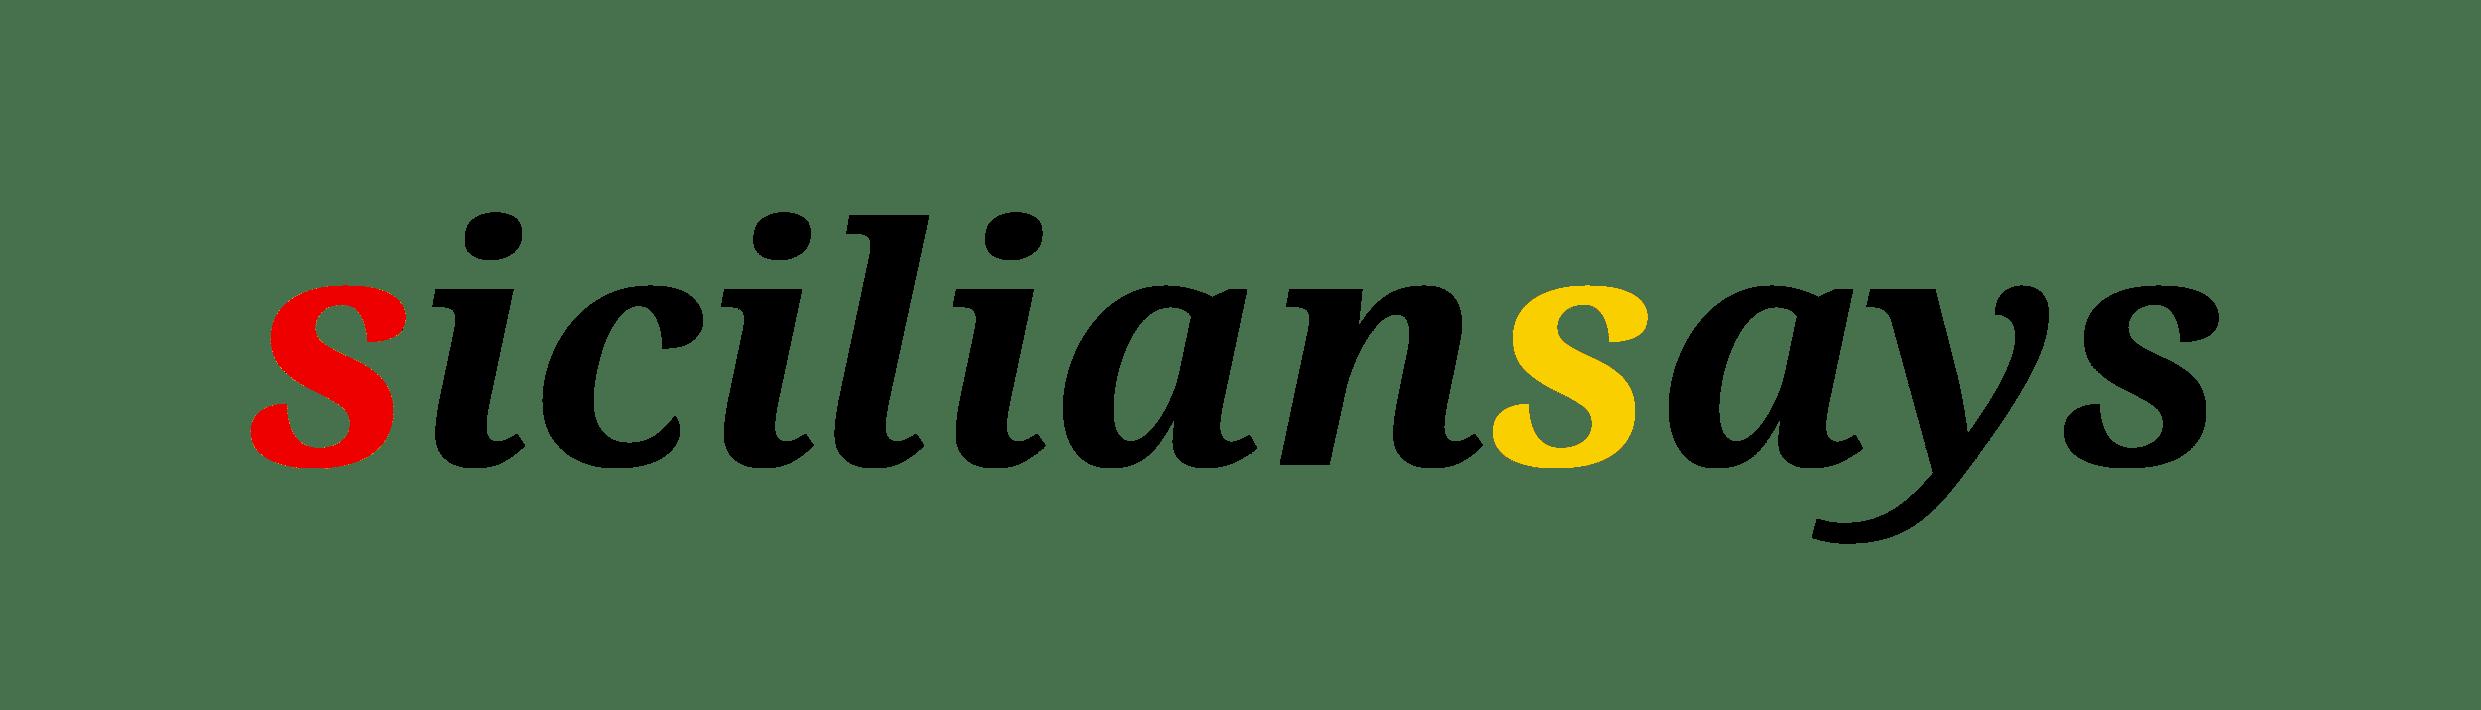 SicilianSays